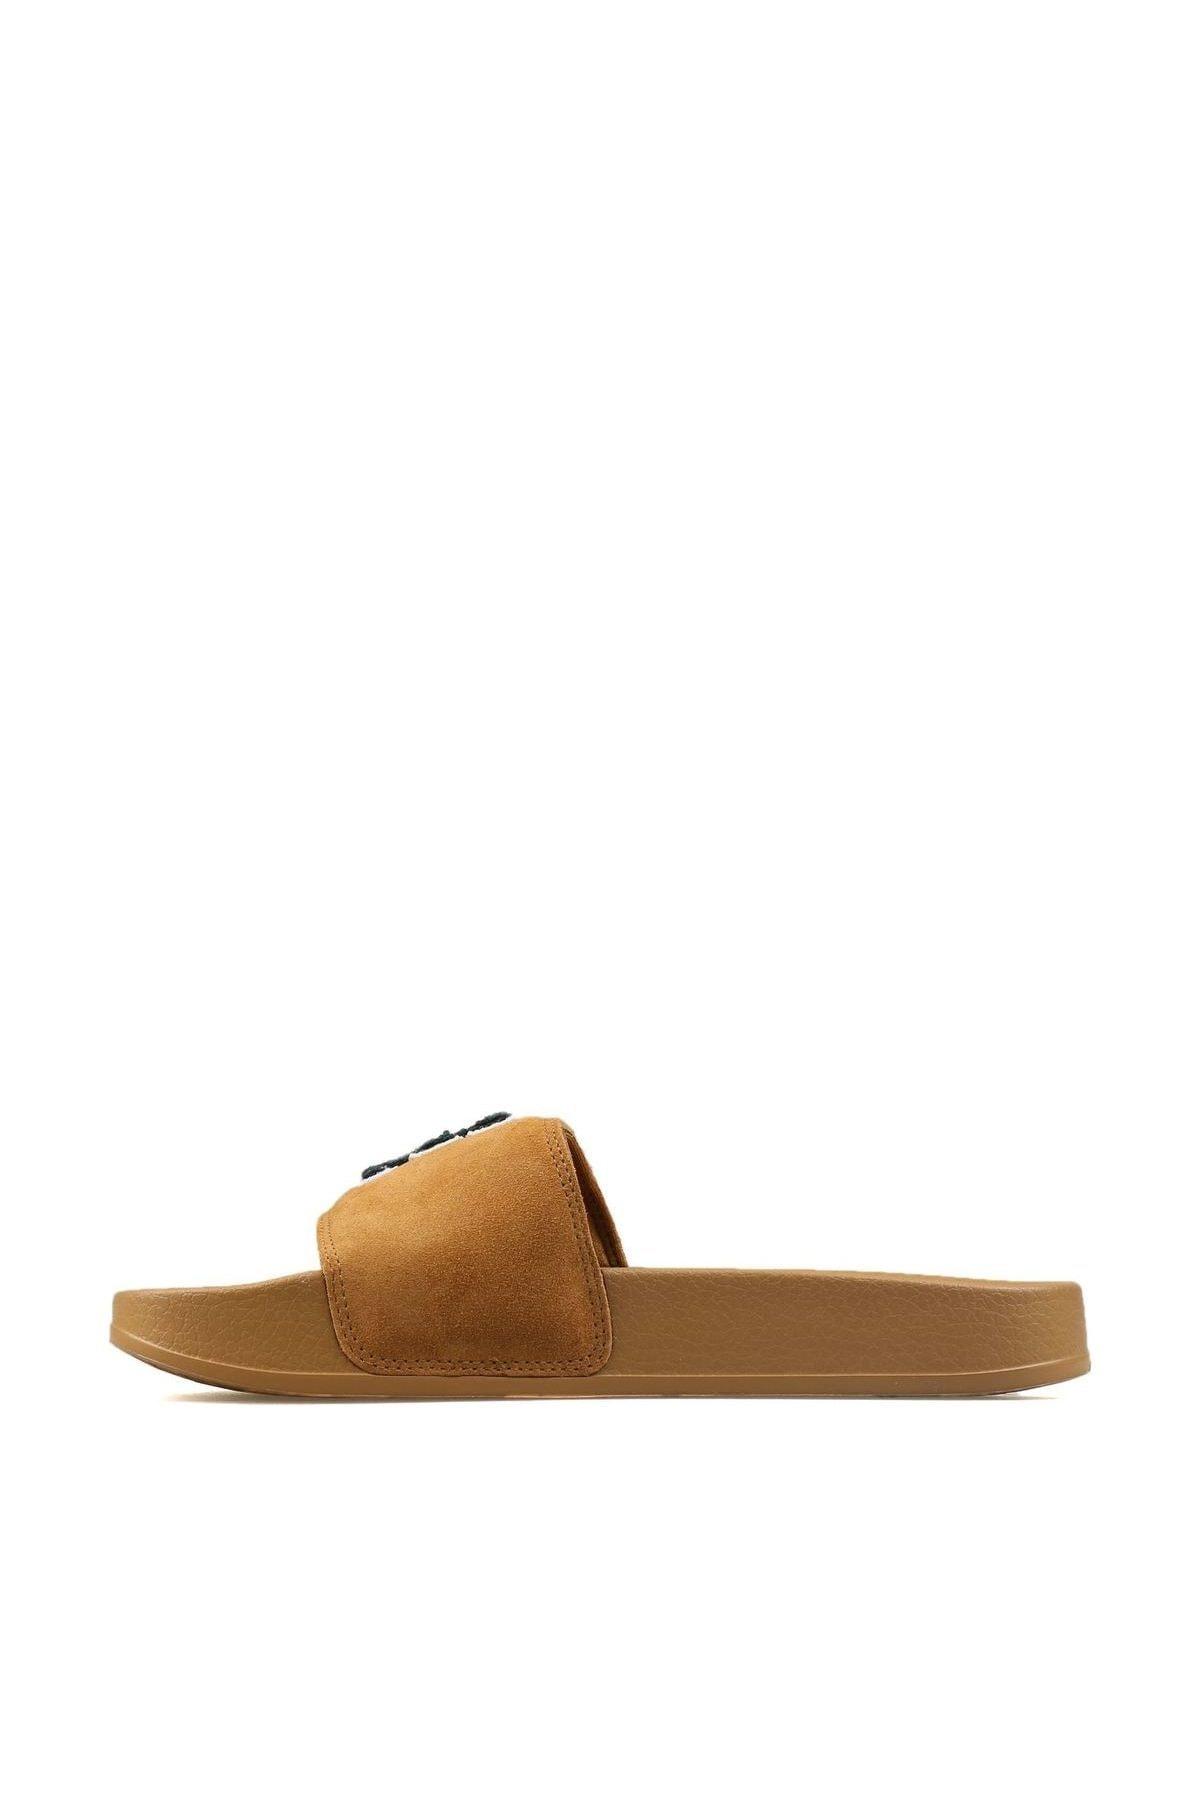 Puma Kadın Sneaker - 36708702 LeadFenty Fu - 36708702 2